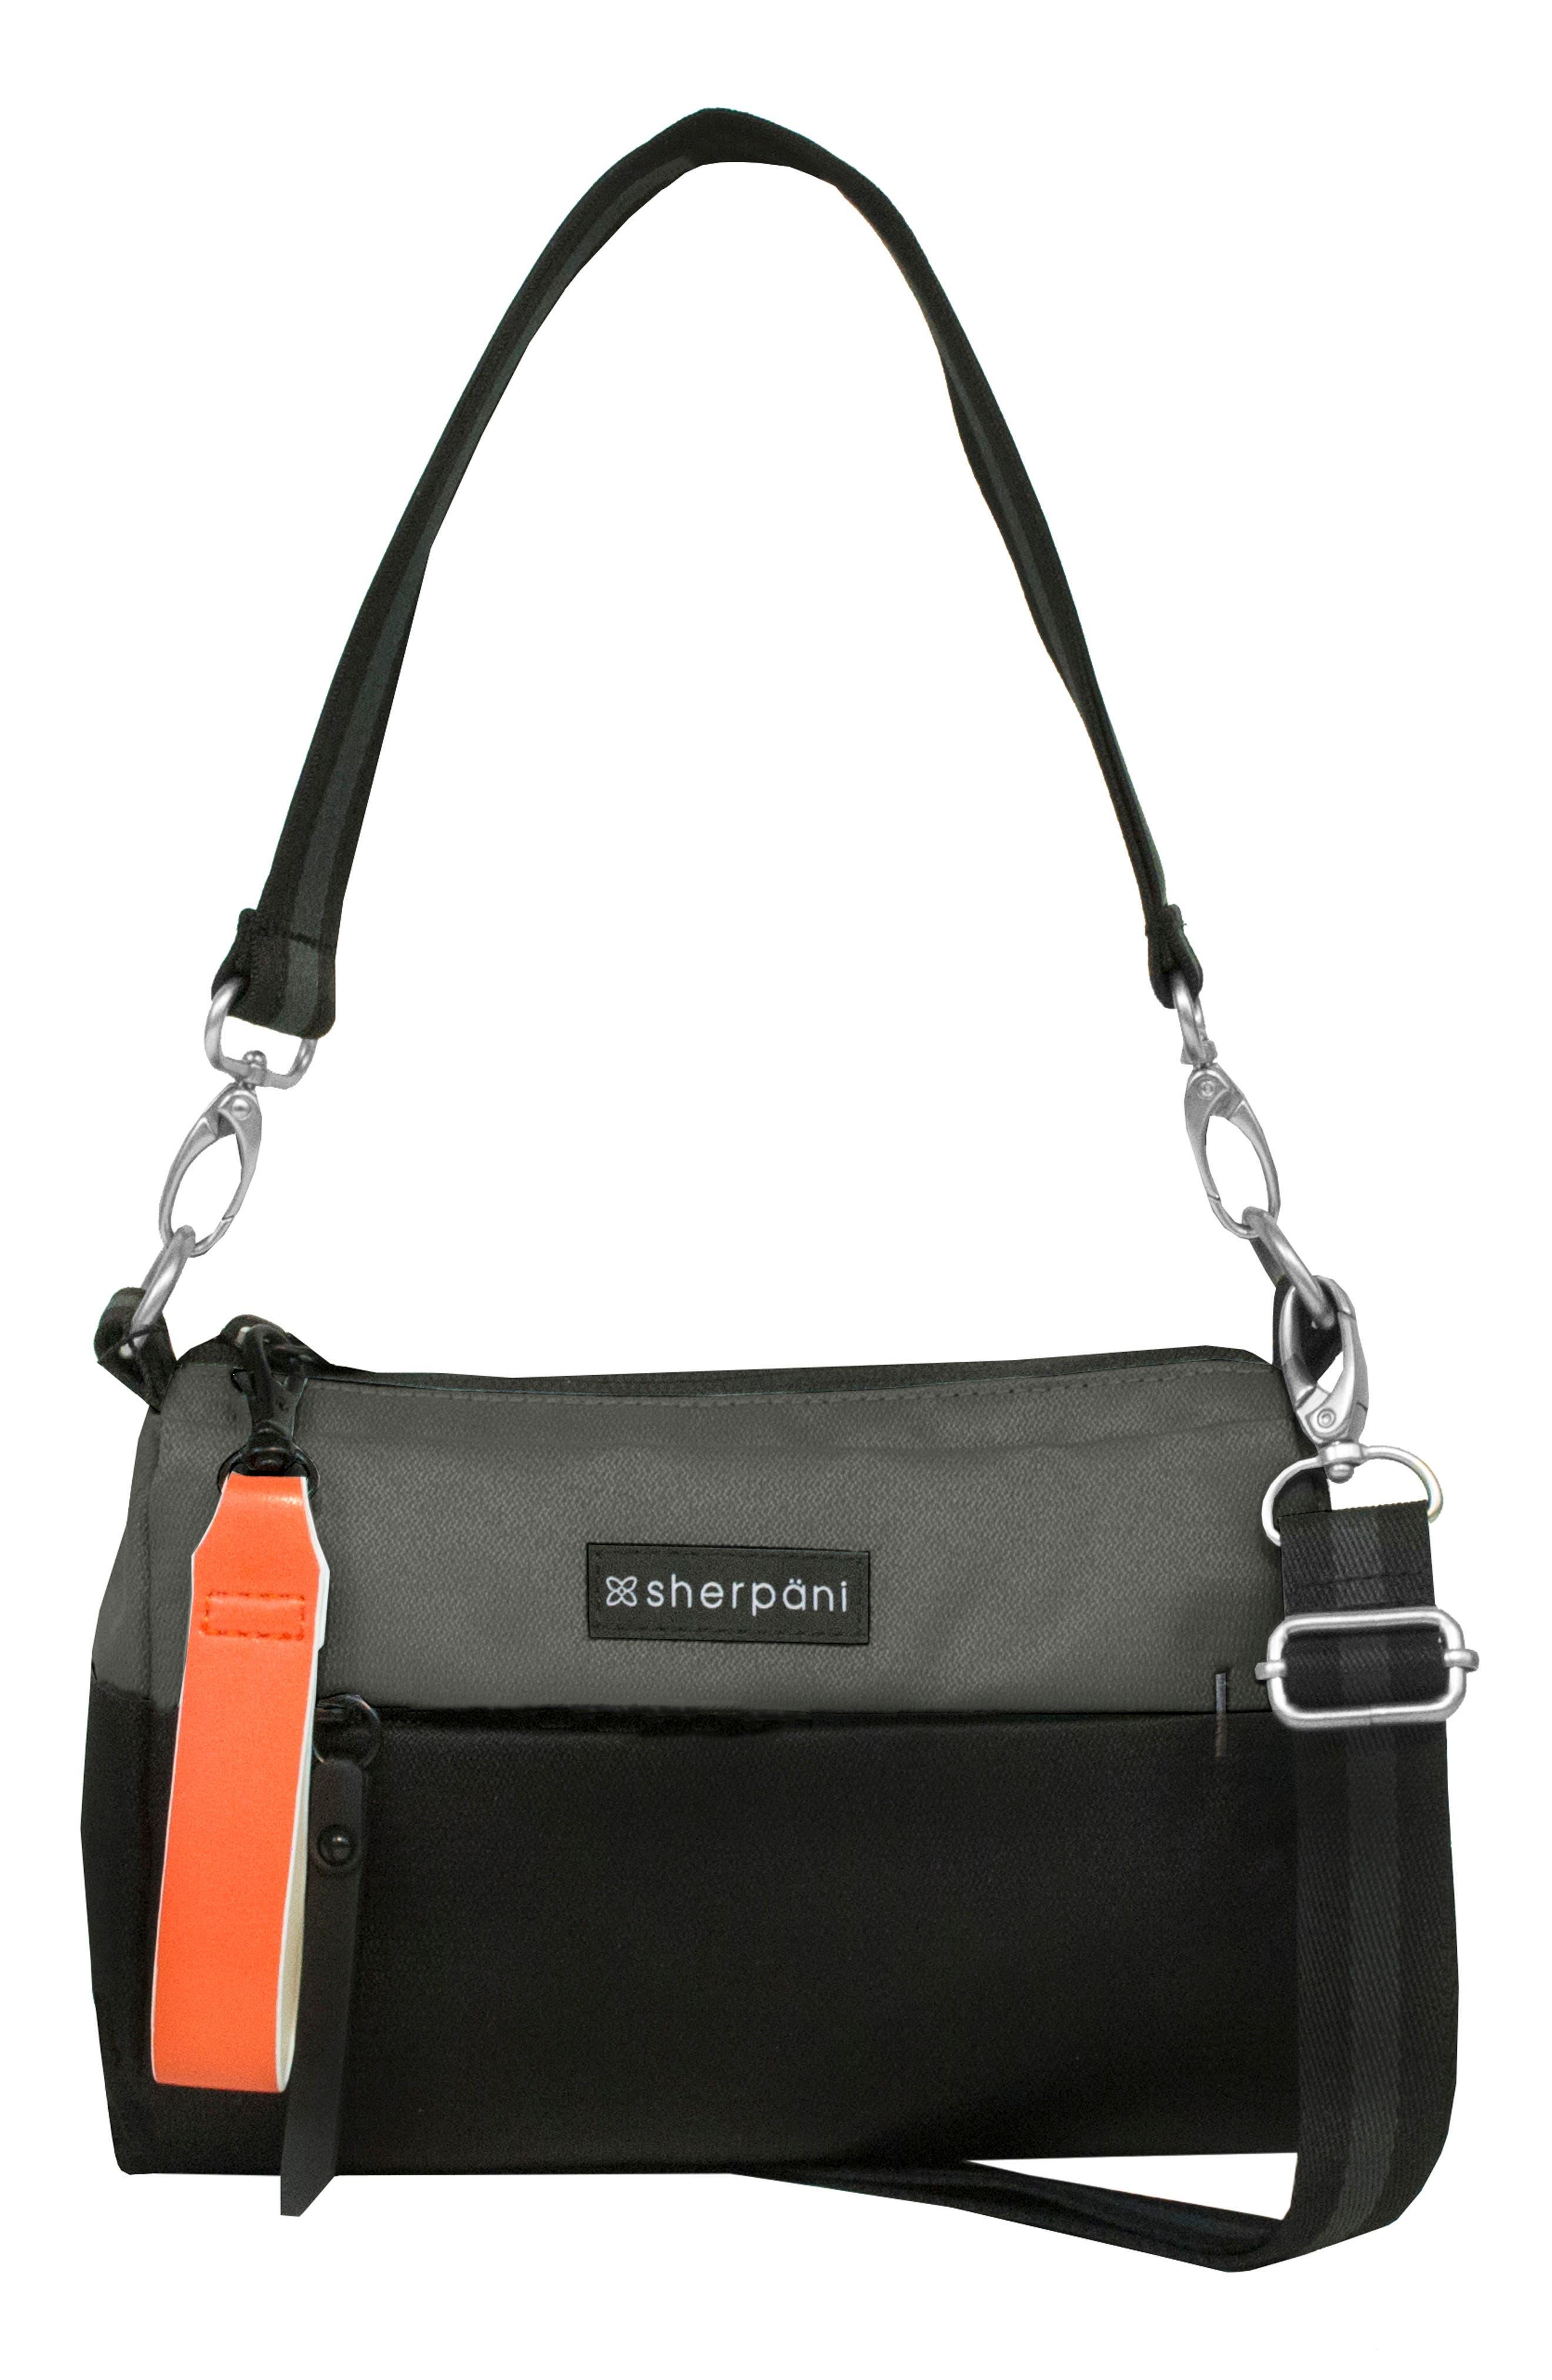 beef4f099 Sherpani Mini Skye Convertible Crossbody Bag - Grey